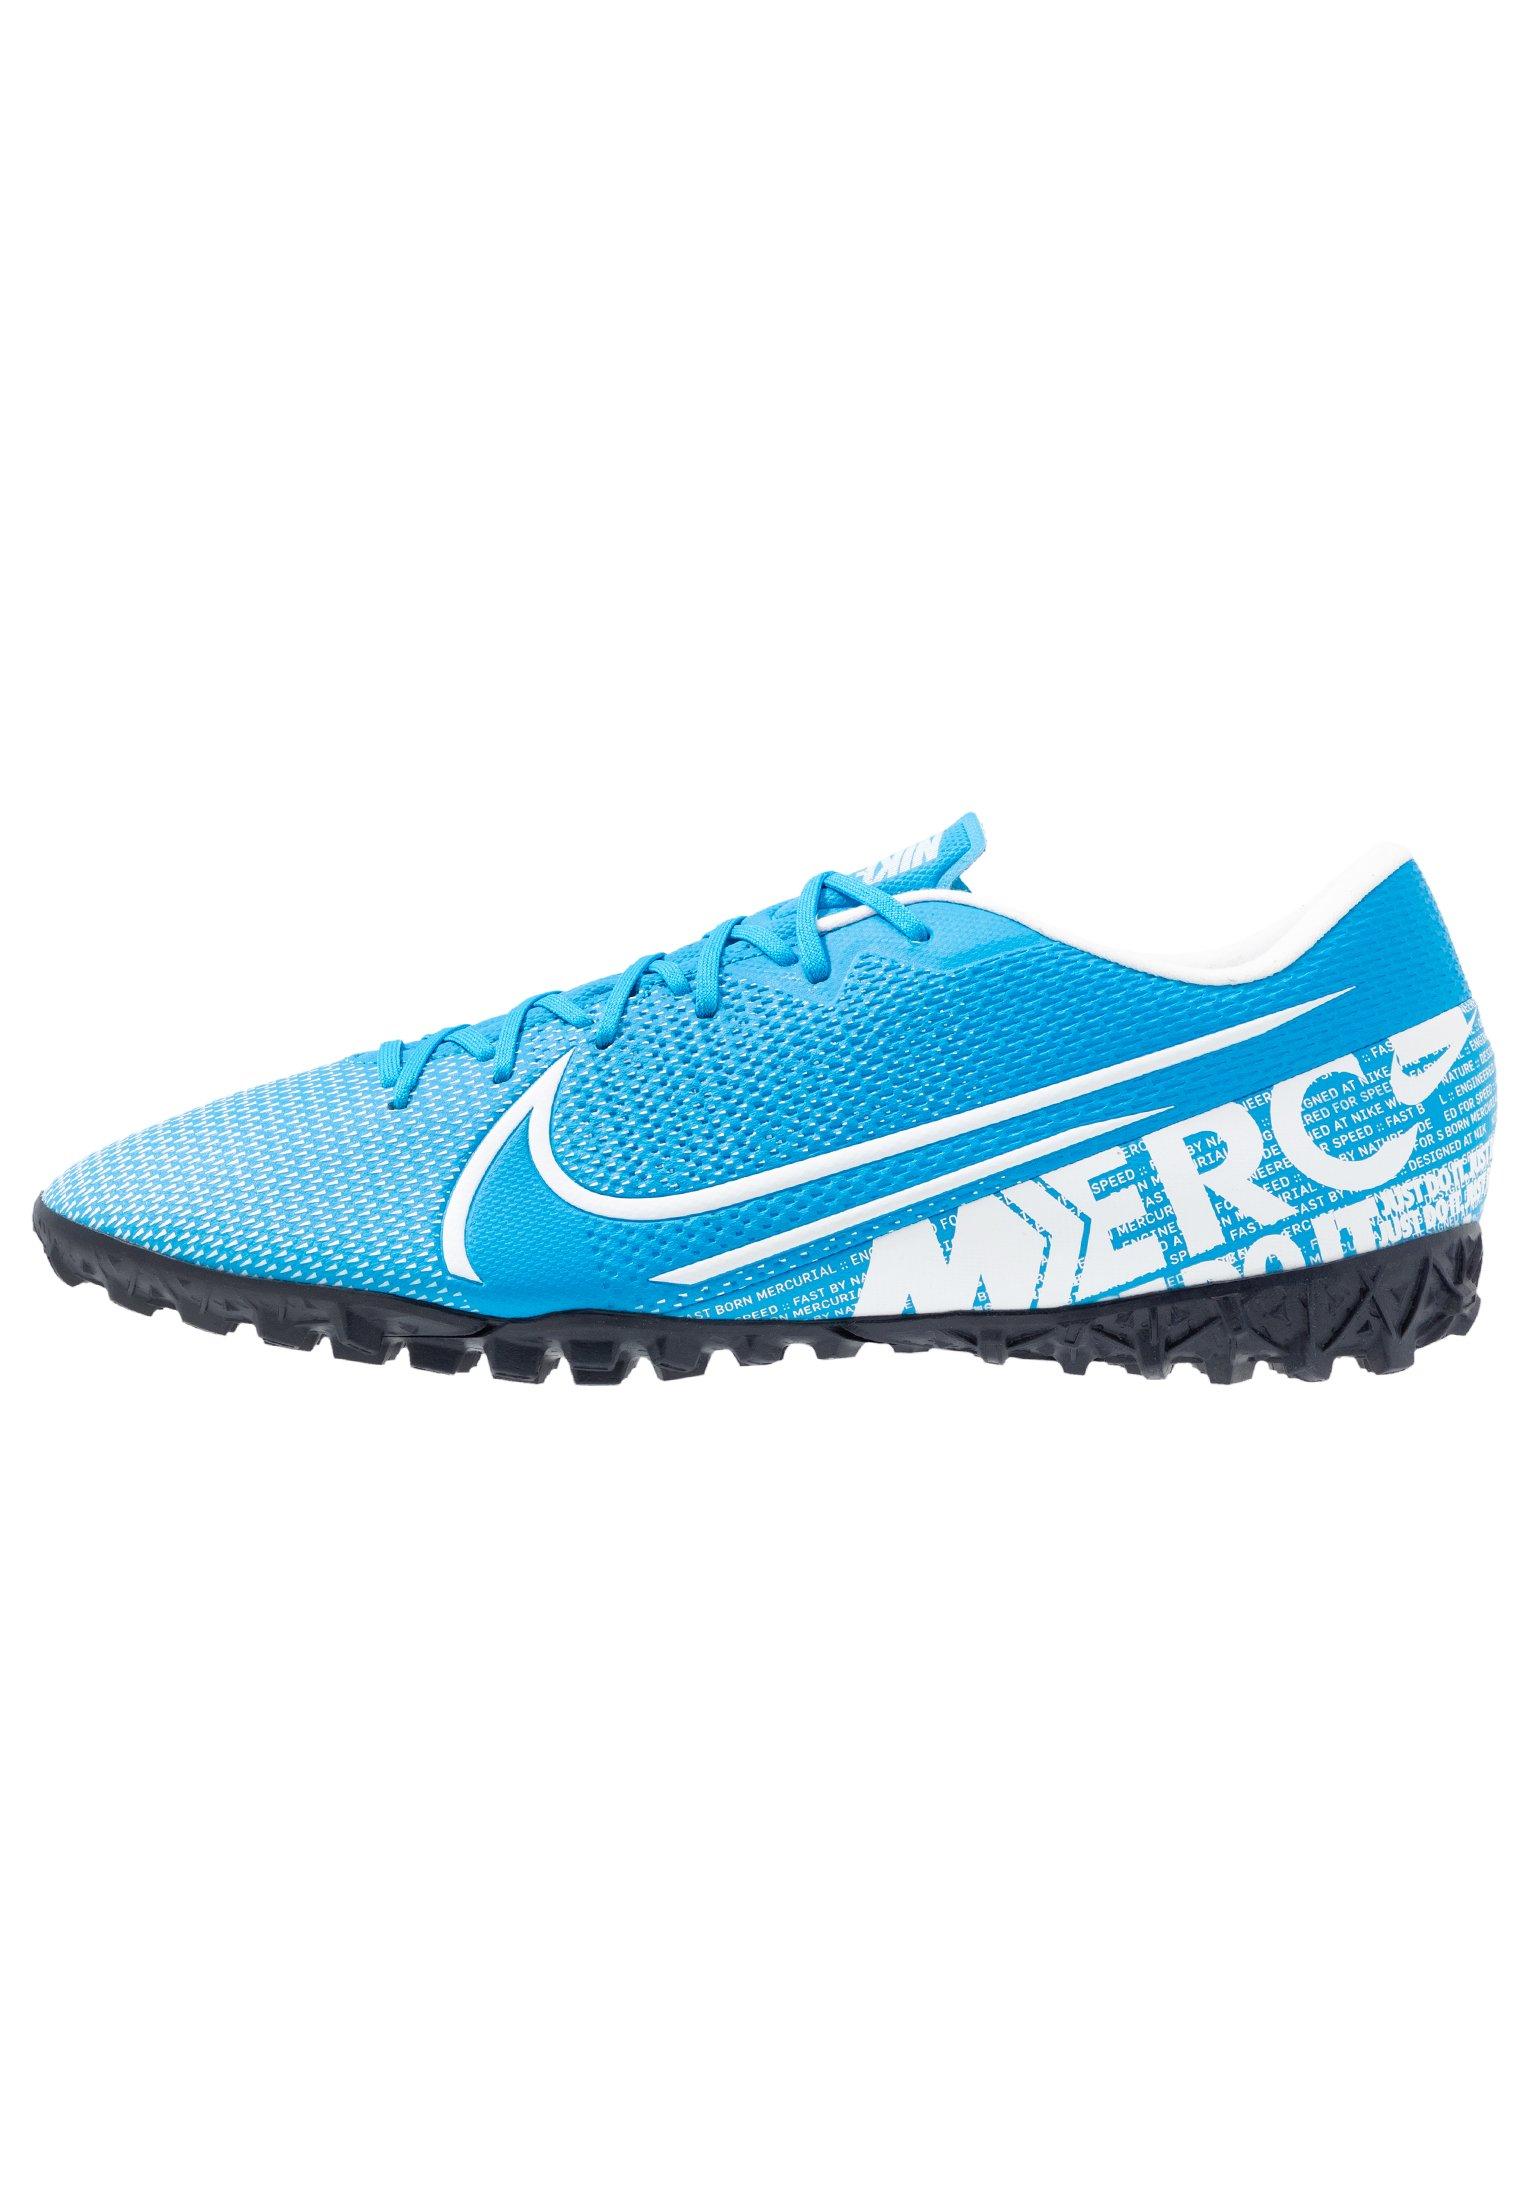 MERCURIAL VAPOR 13 ACADEMY TF Chaussures de foot multicrampons blue herowhiteobsidian